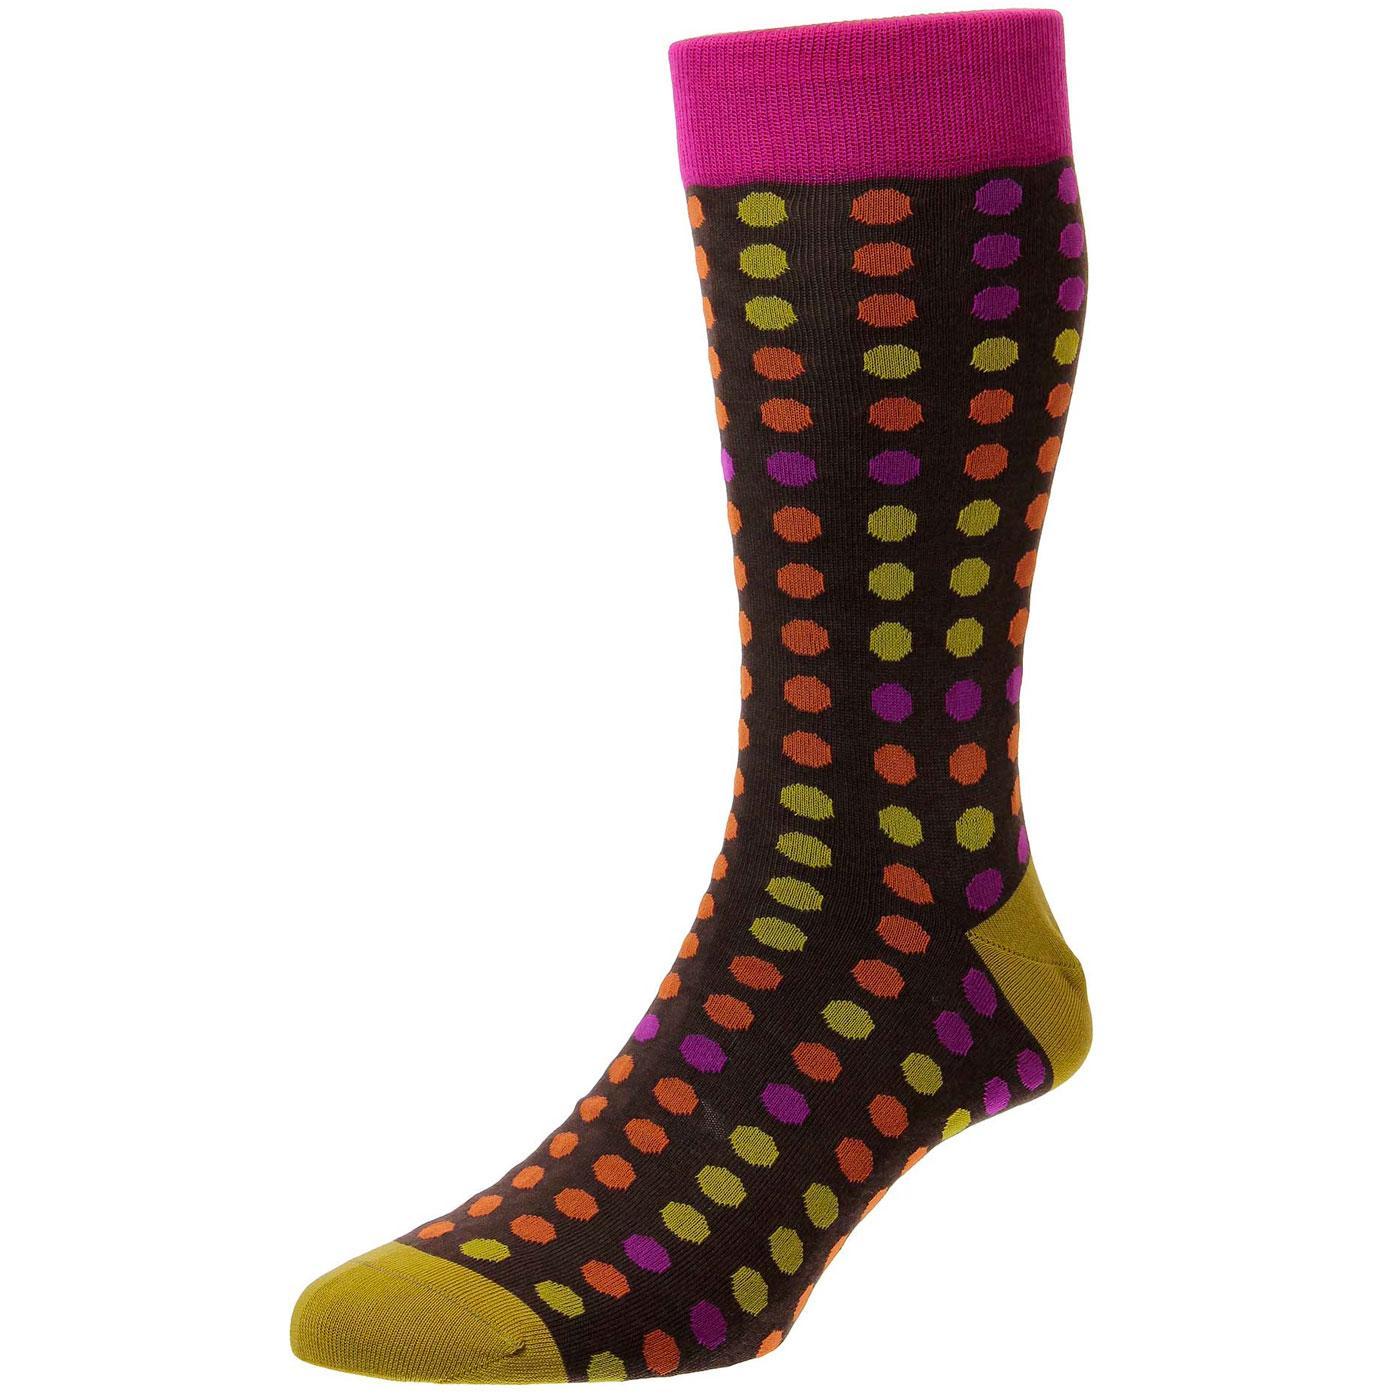 + Simkin PANTHERELLA Retro Polka Dot Socks (Mocha)